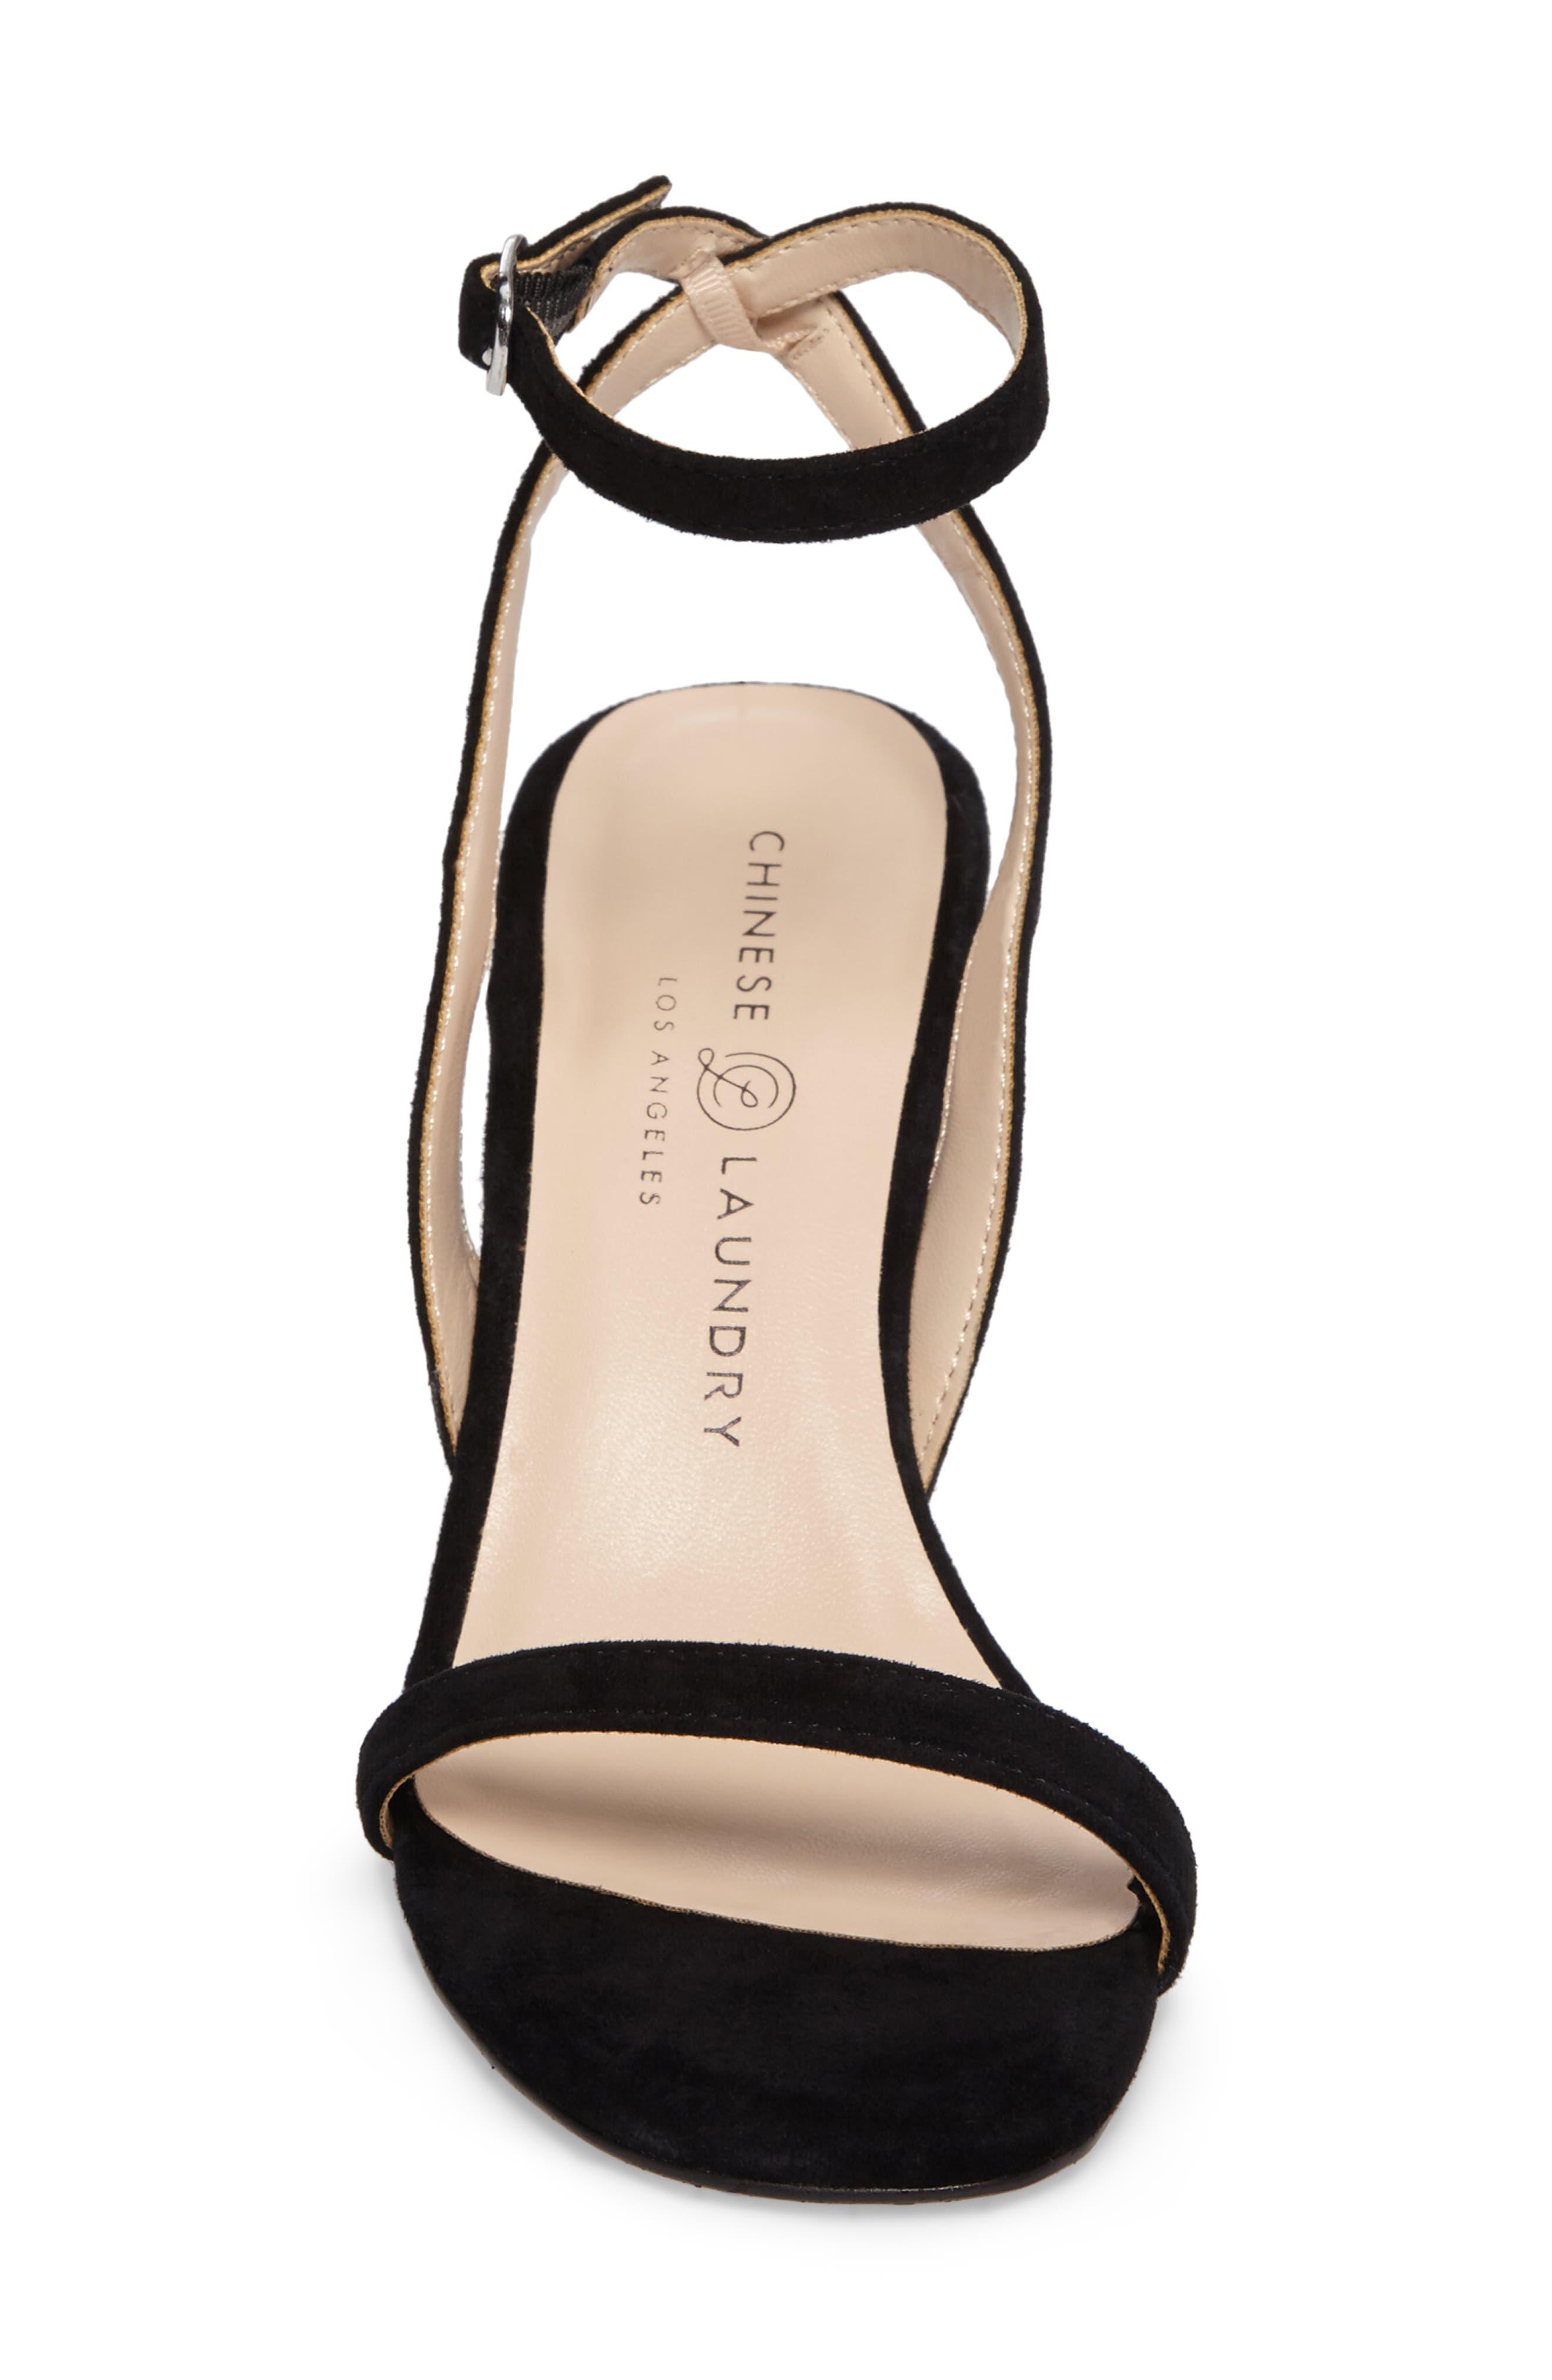 Shanie Clear Heel Sandal,                             Alternate thumbnail 4, color,                             001